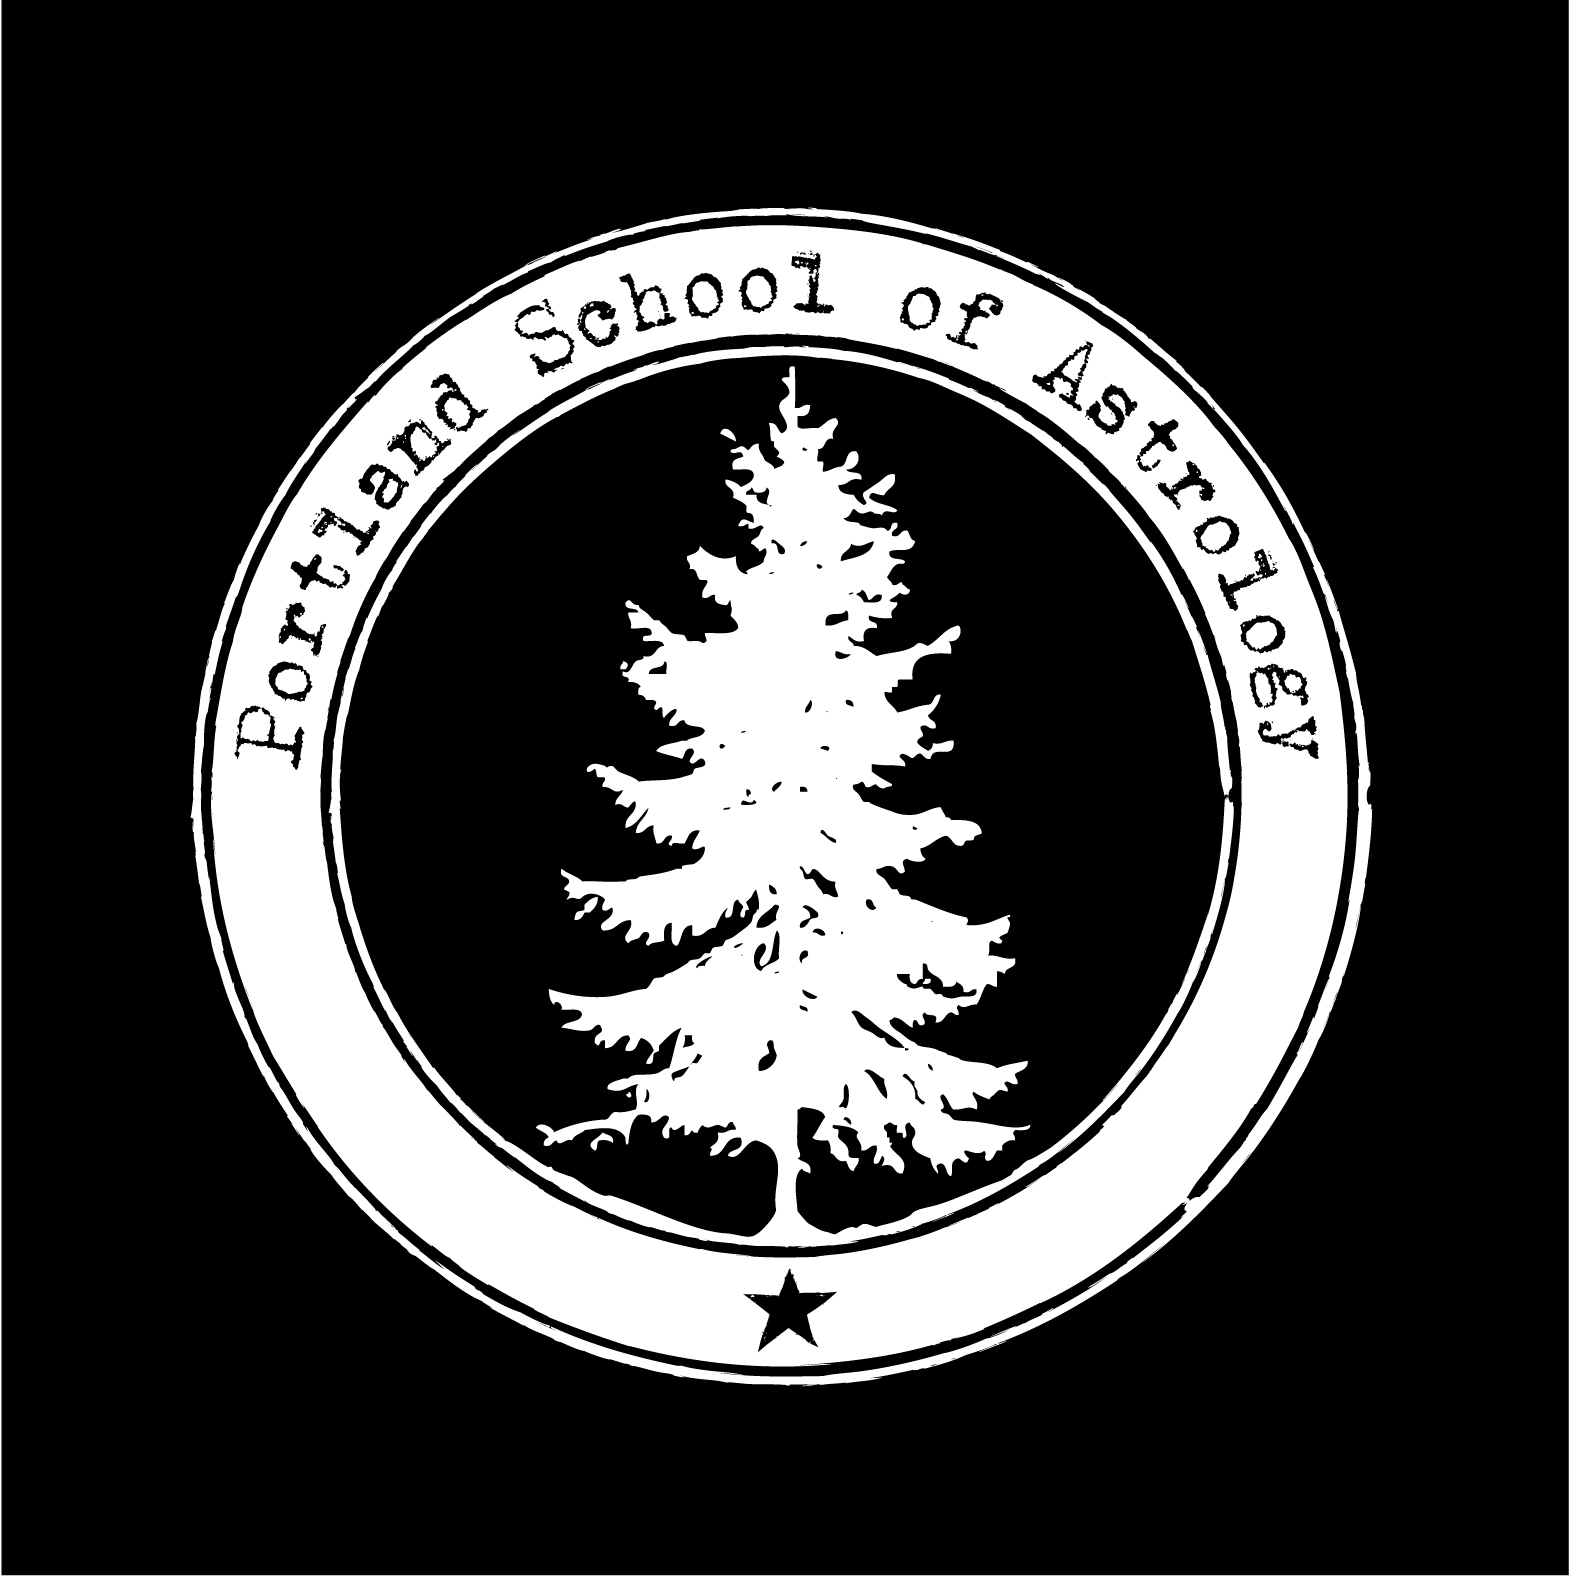 Portland School of Astrology in Portland, Oregon.